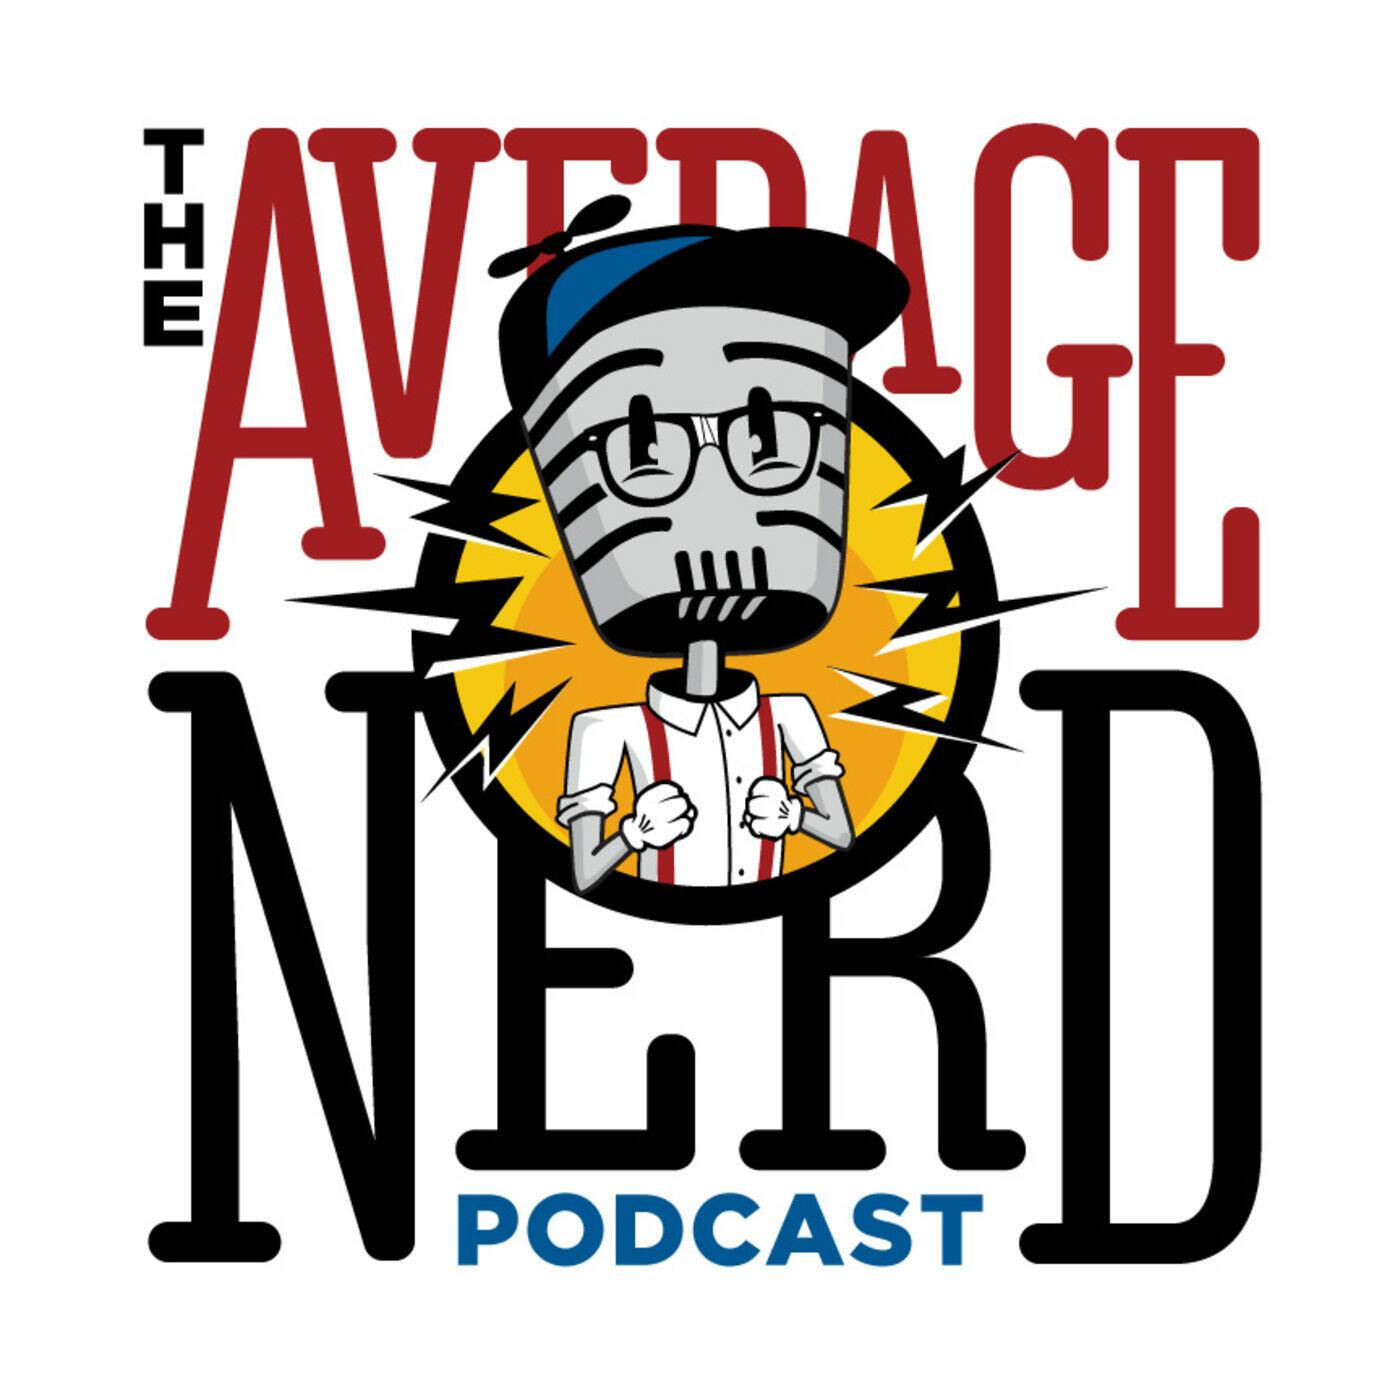 The Average Nerd